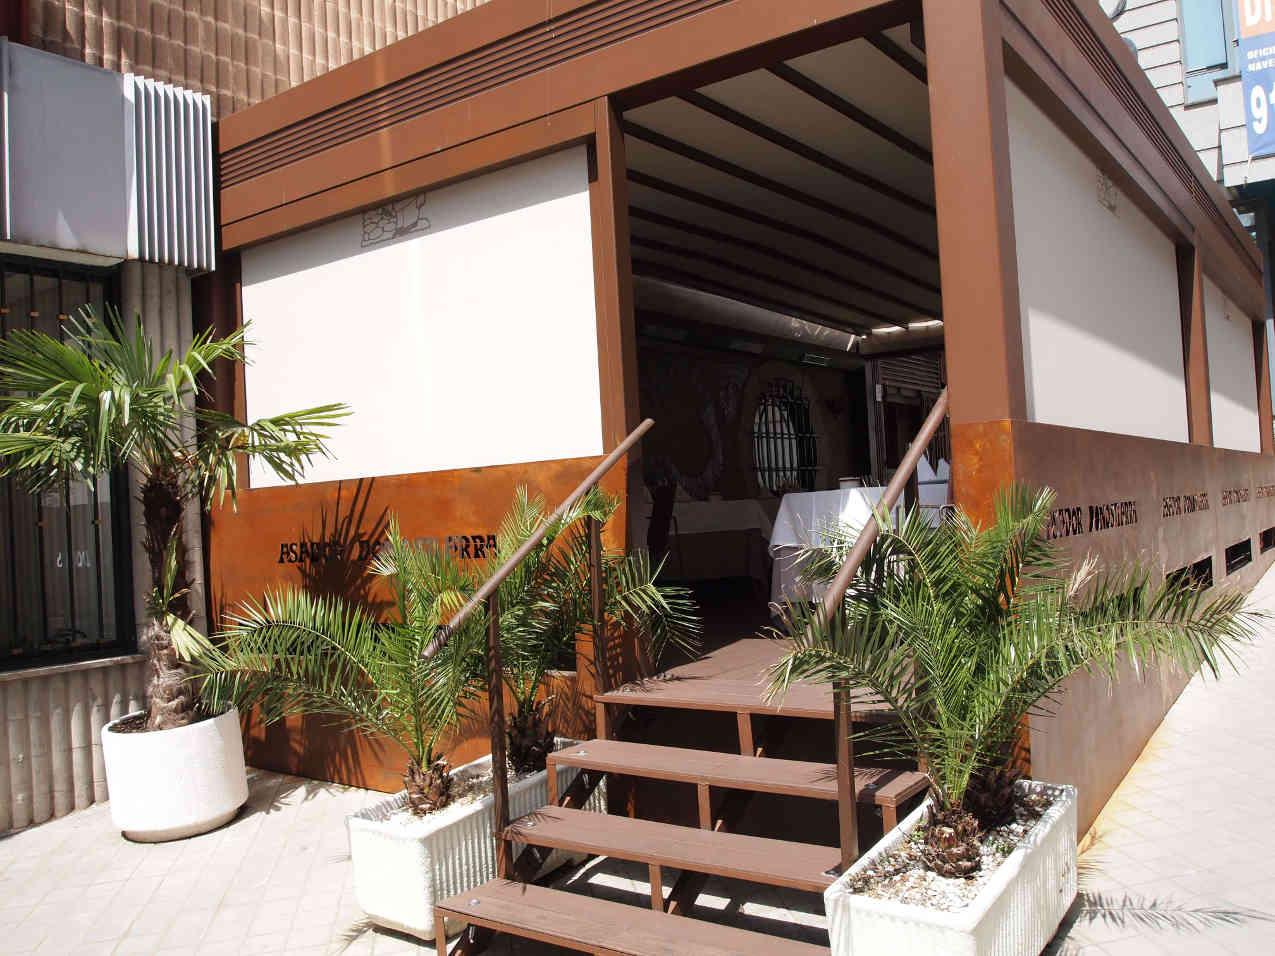 Reforma terraza restaurante co co espacios - Reformas vega ...